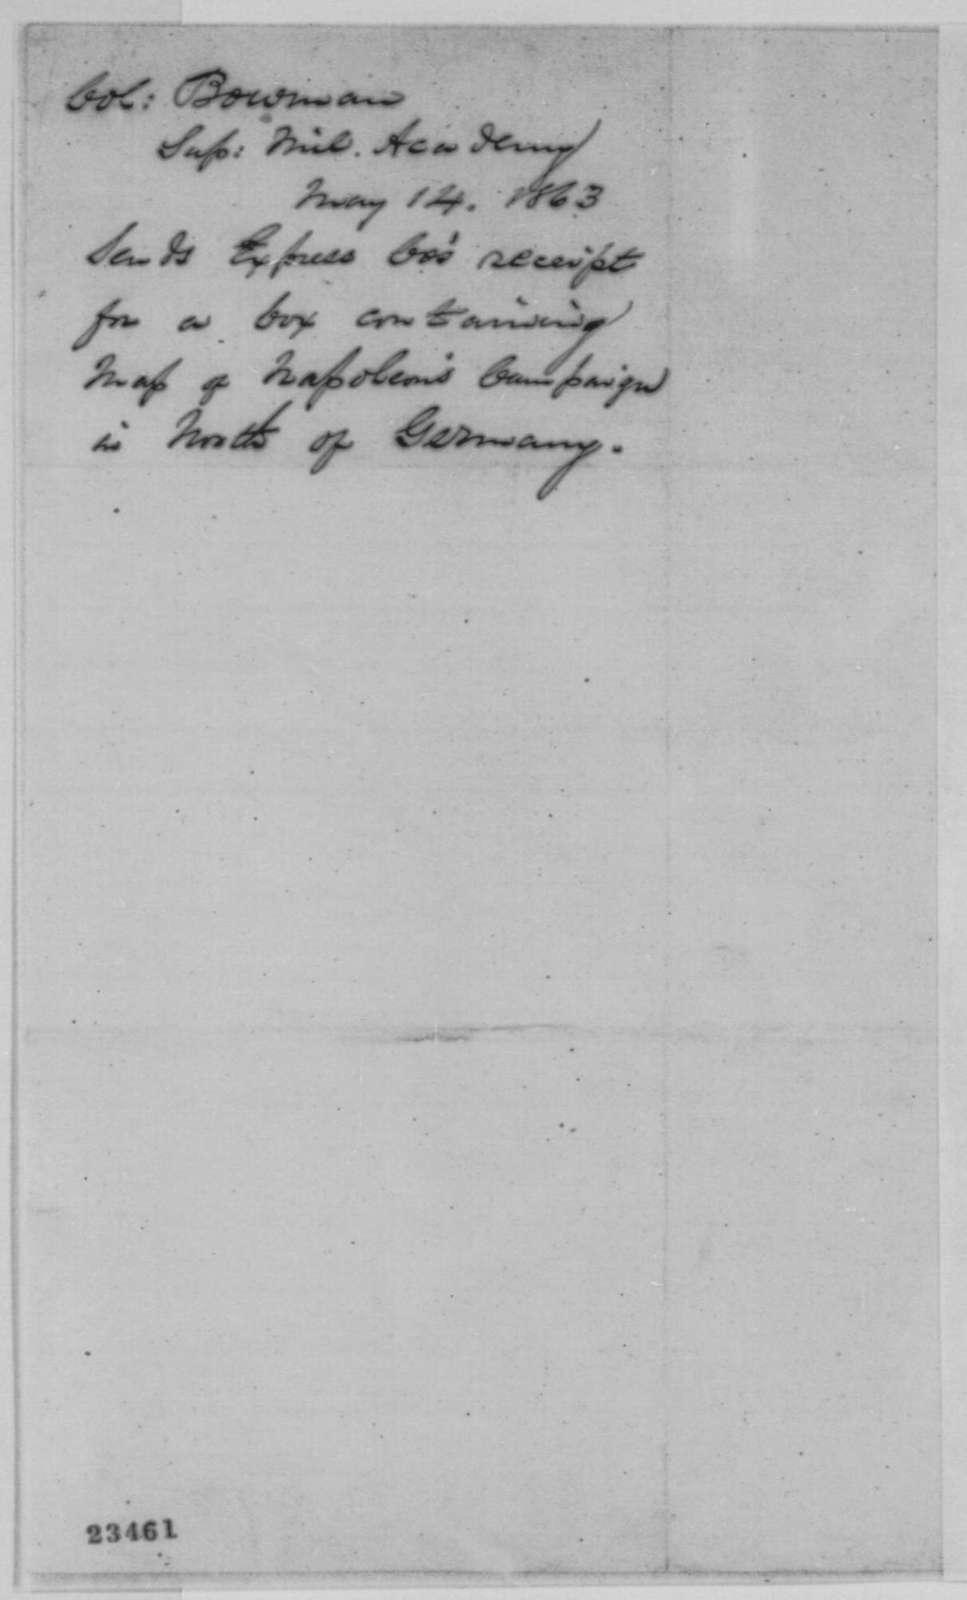 Alexander Hamilton Bowman to John G. Nicolay, Thursday, May 14, 1863  (Sends express receipt)